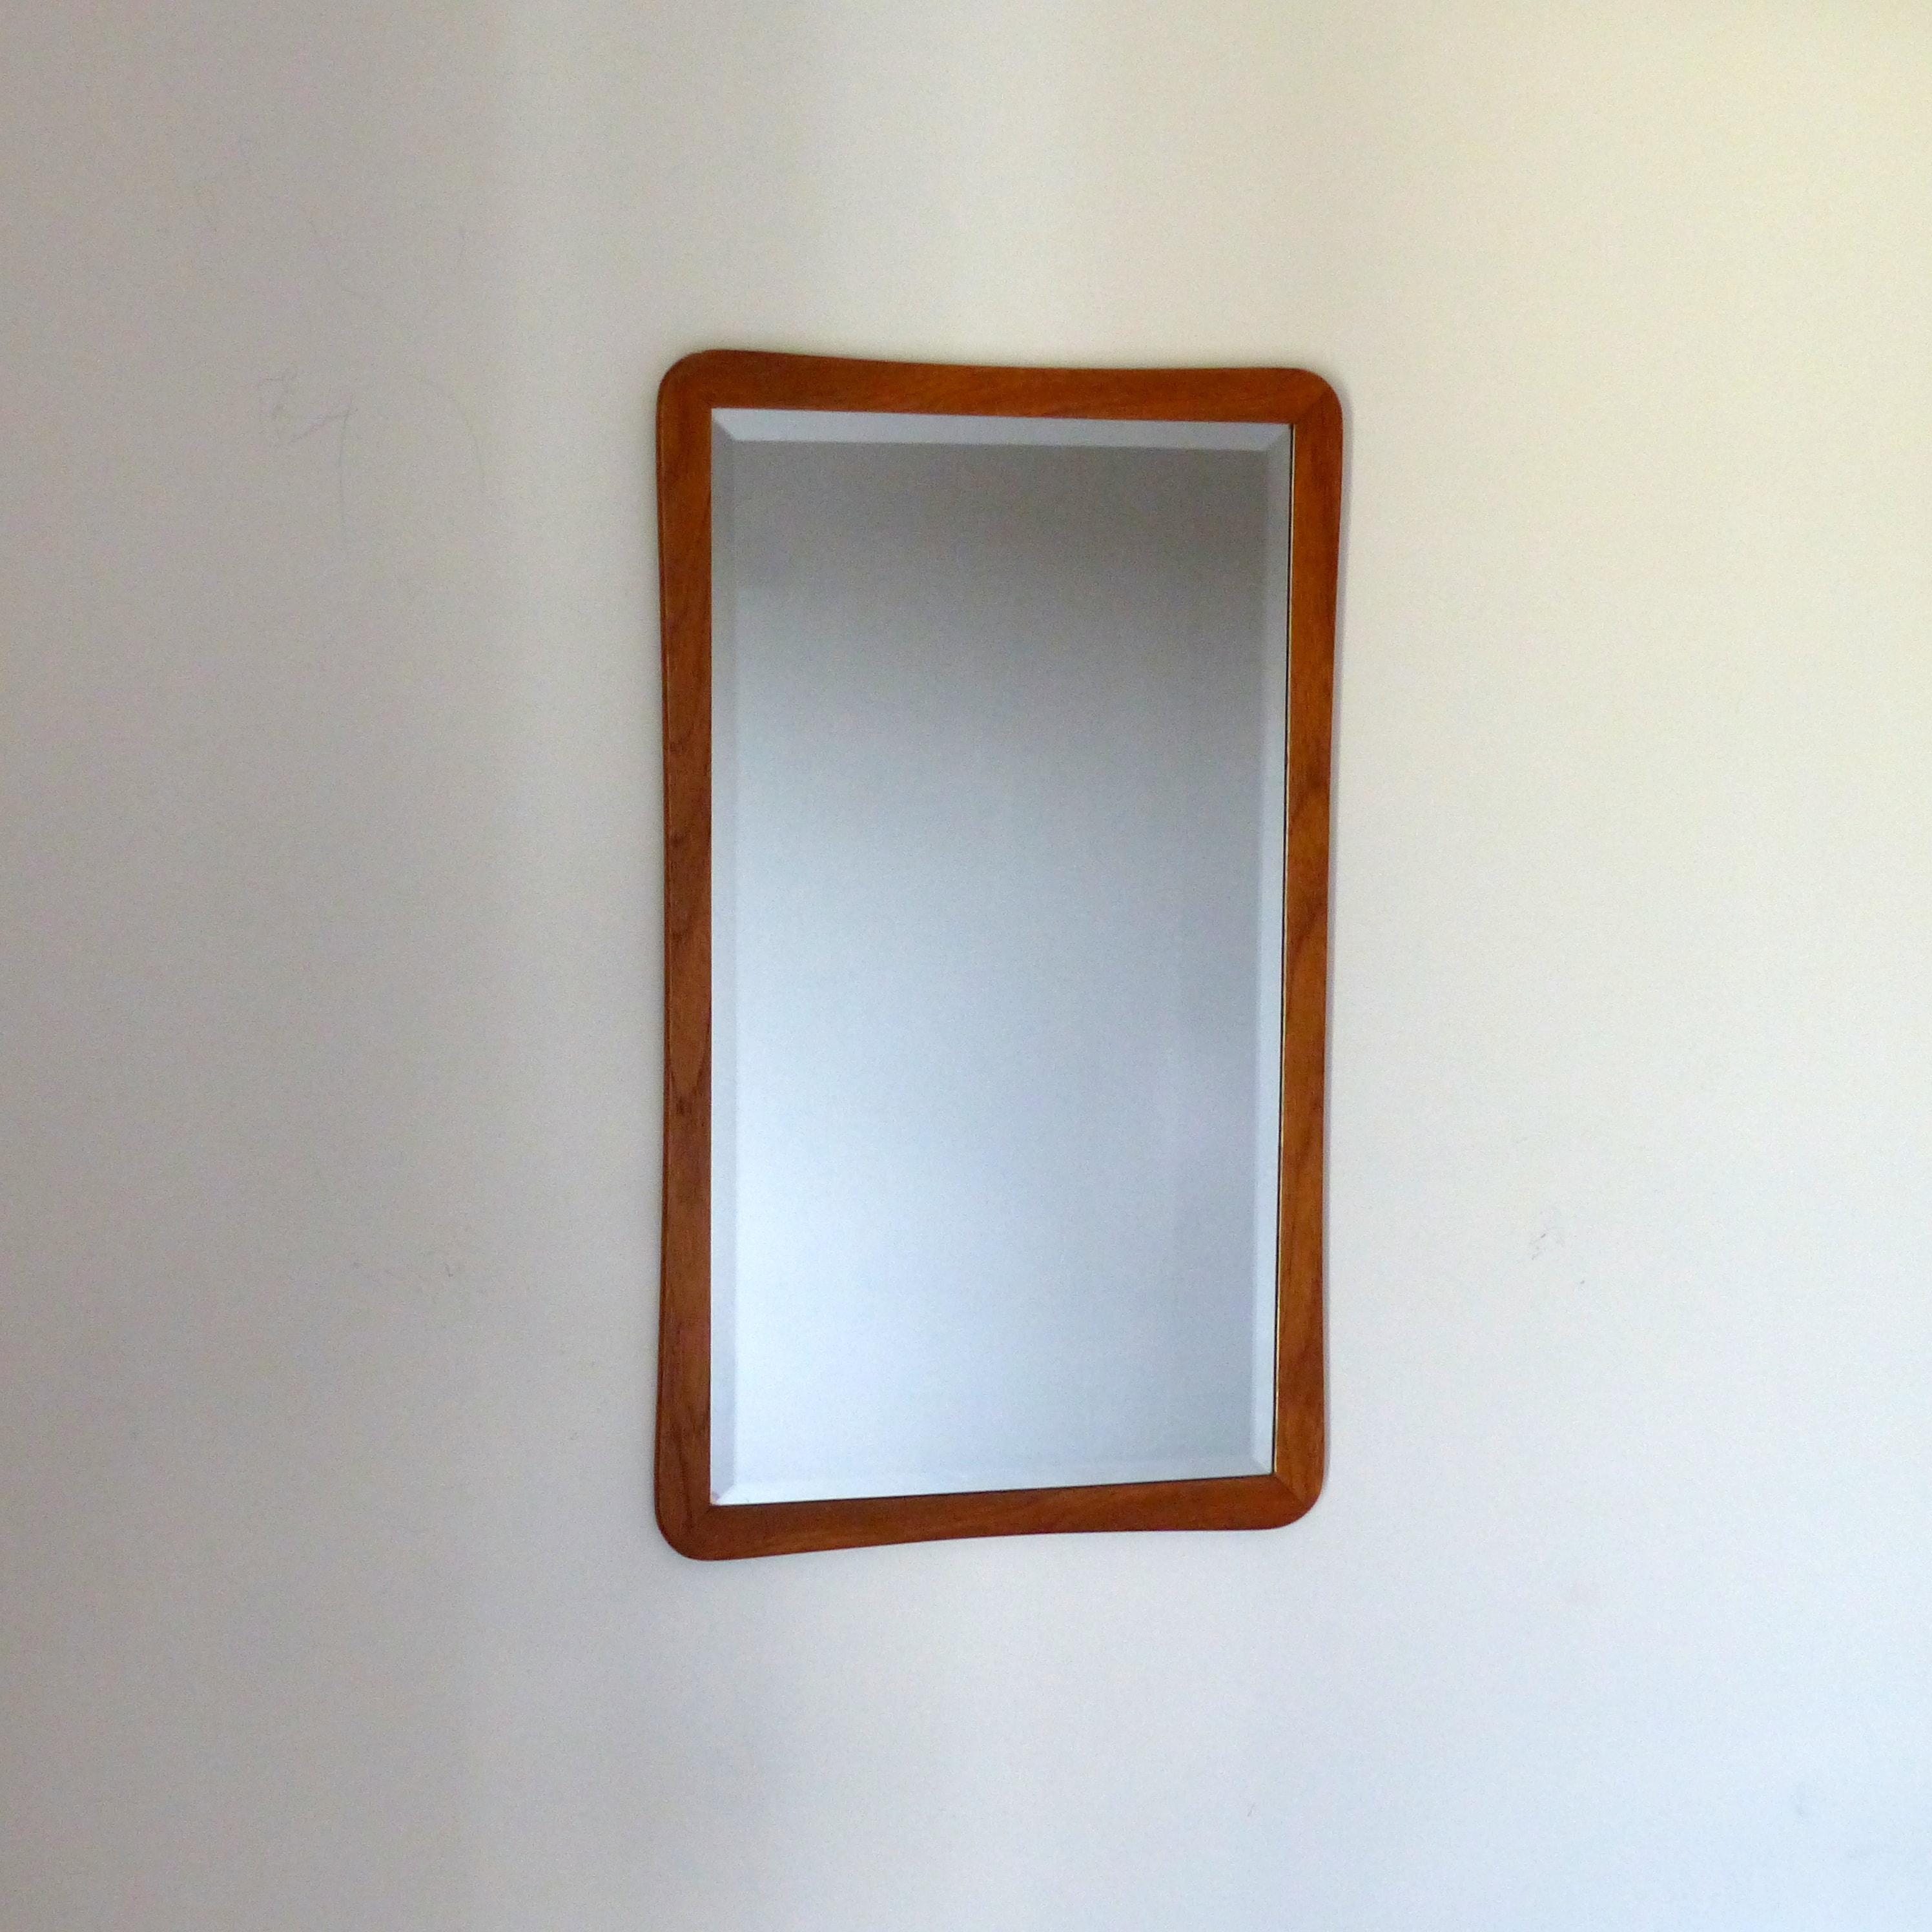 miroir scandinave asym trique en teck lignedebrocante